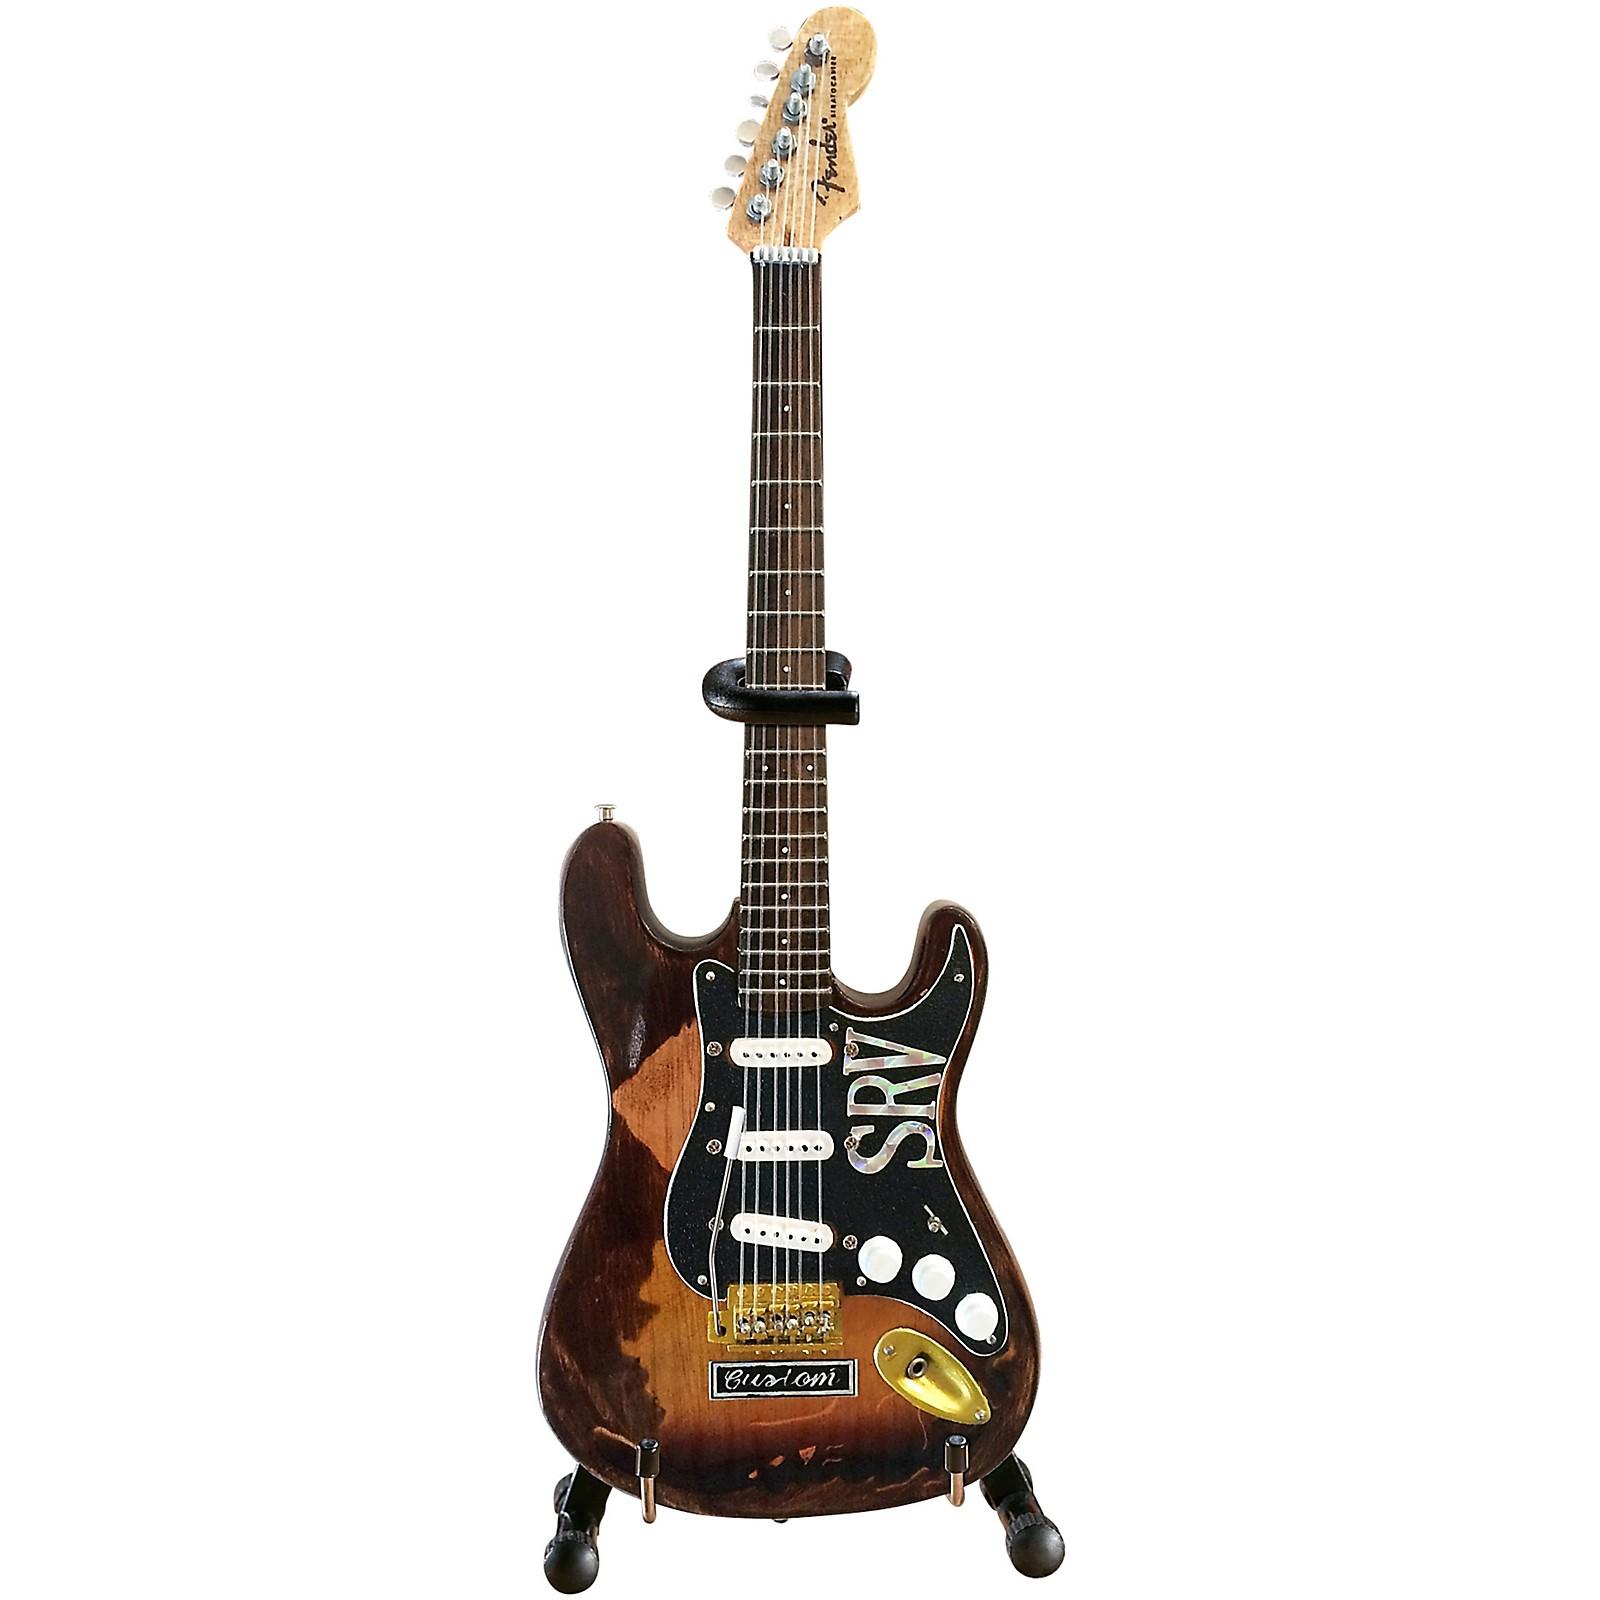 Axe Heaven Fender Stratocaster - Classic Sunburst Finish Officially Licensed Miniature Guitar Replica (SRV Edition)